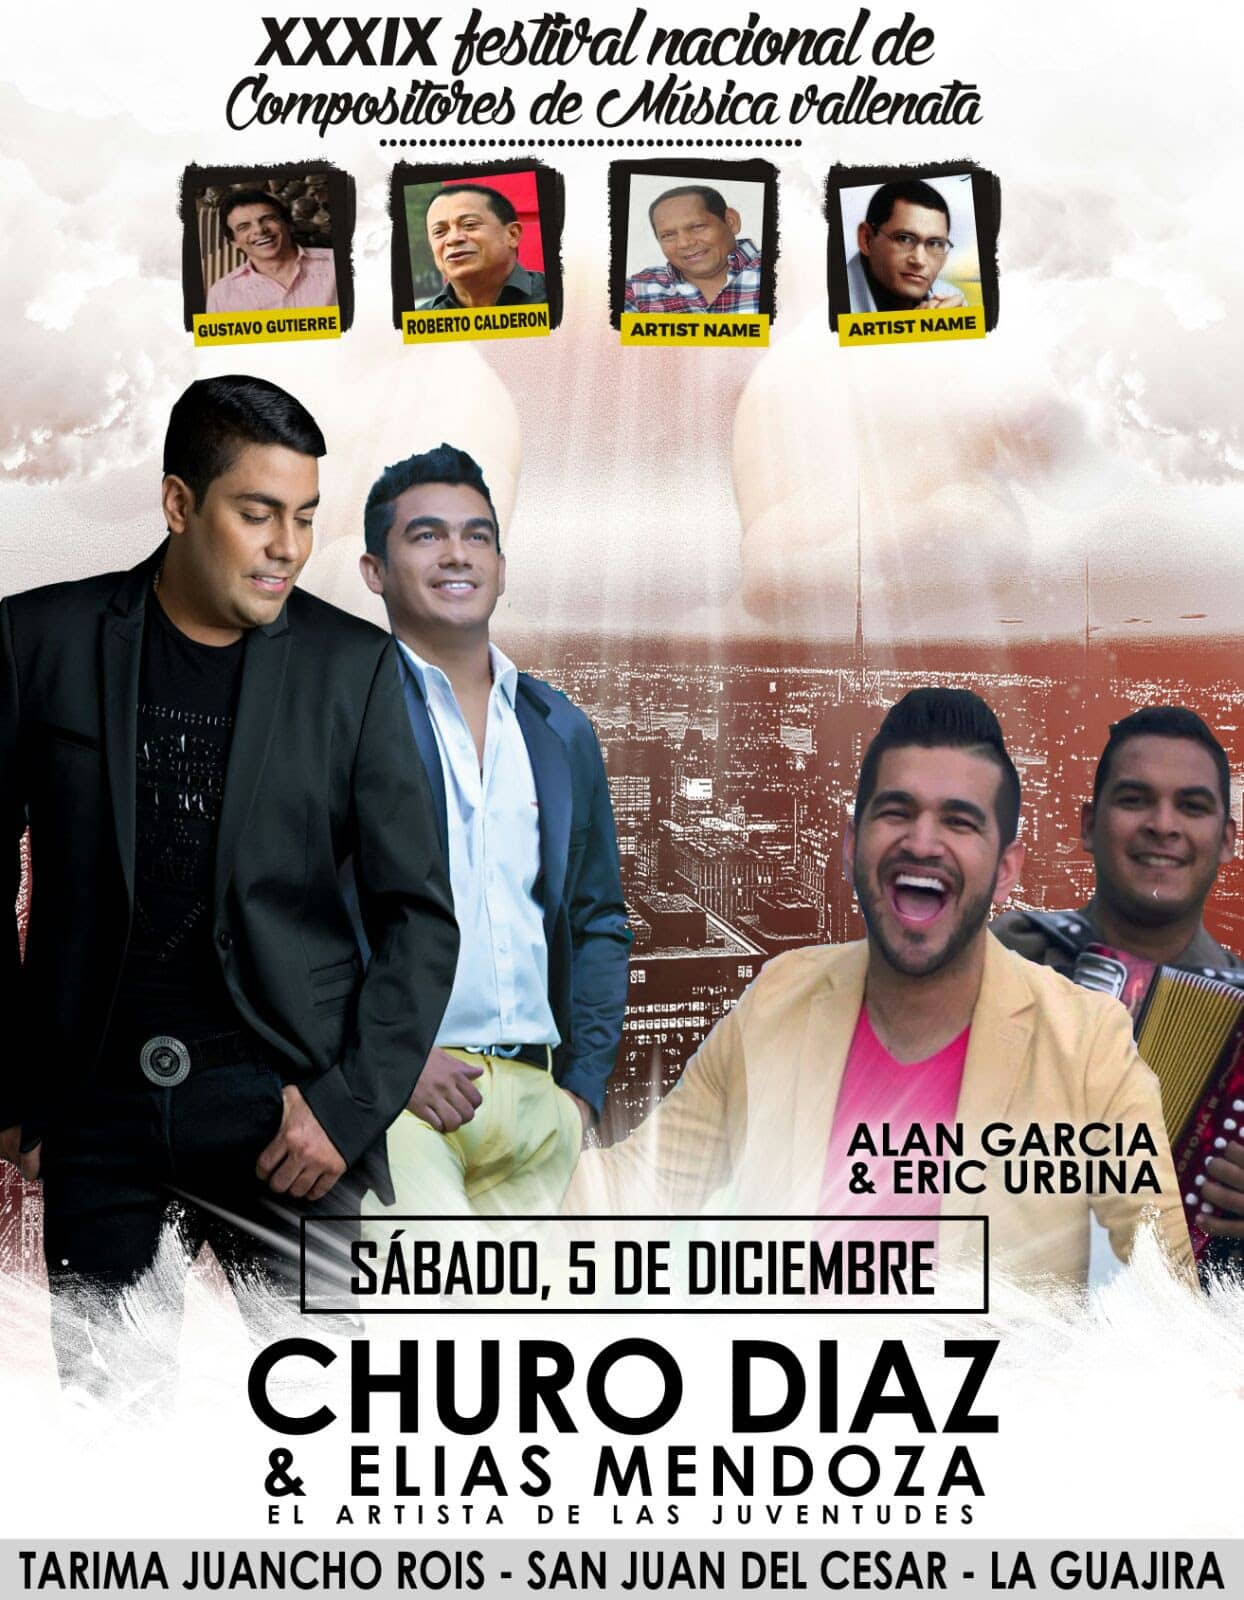 Festival de Compositores de San Juan del Cesar define programación musical